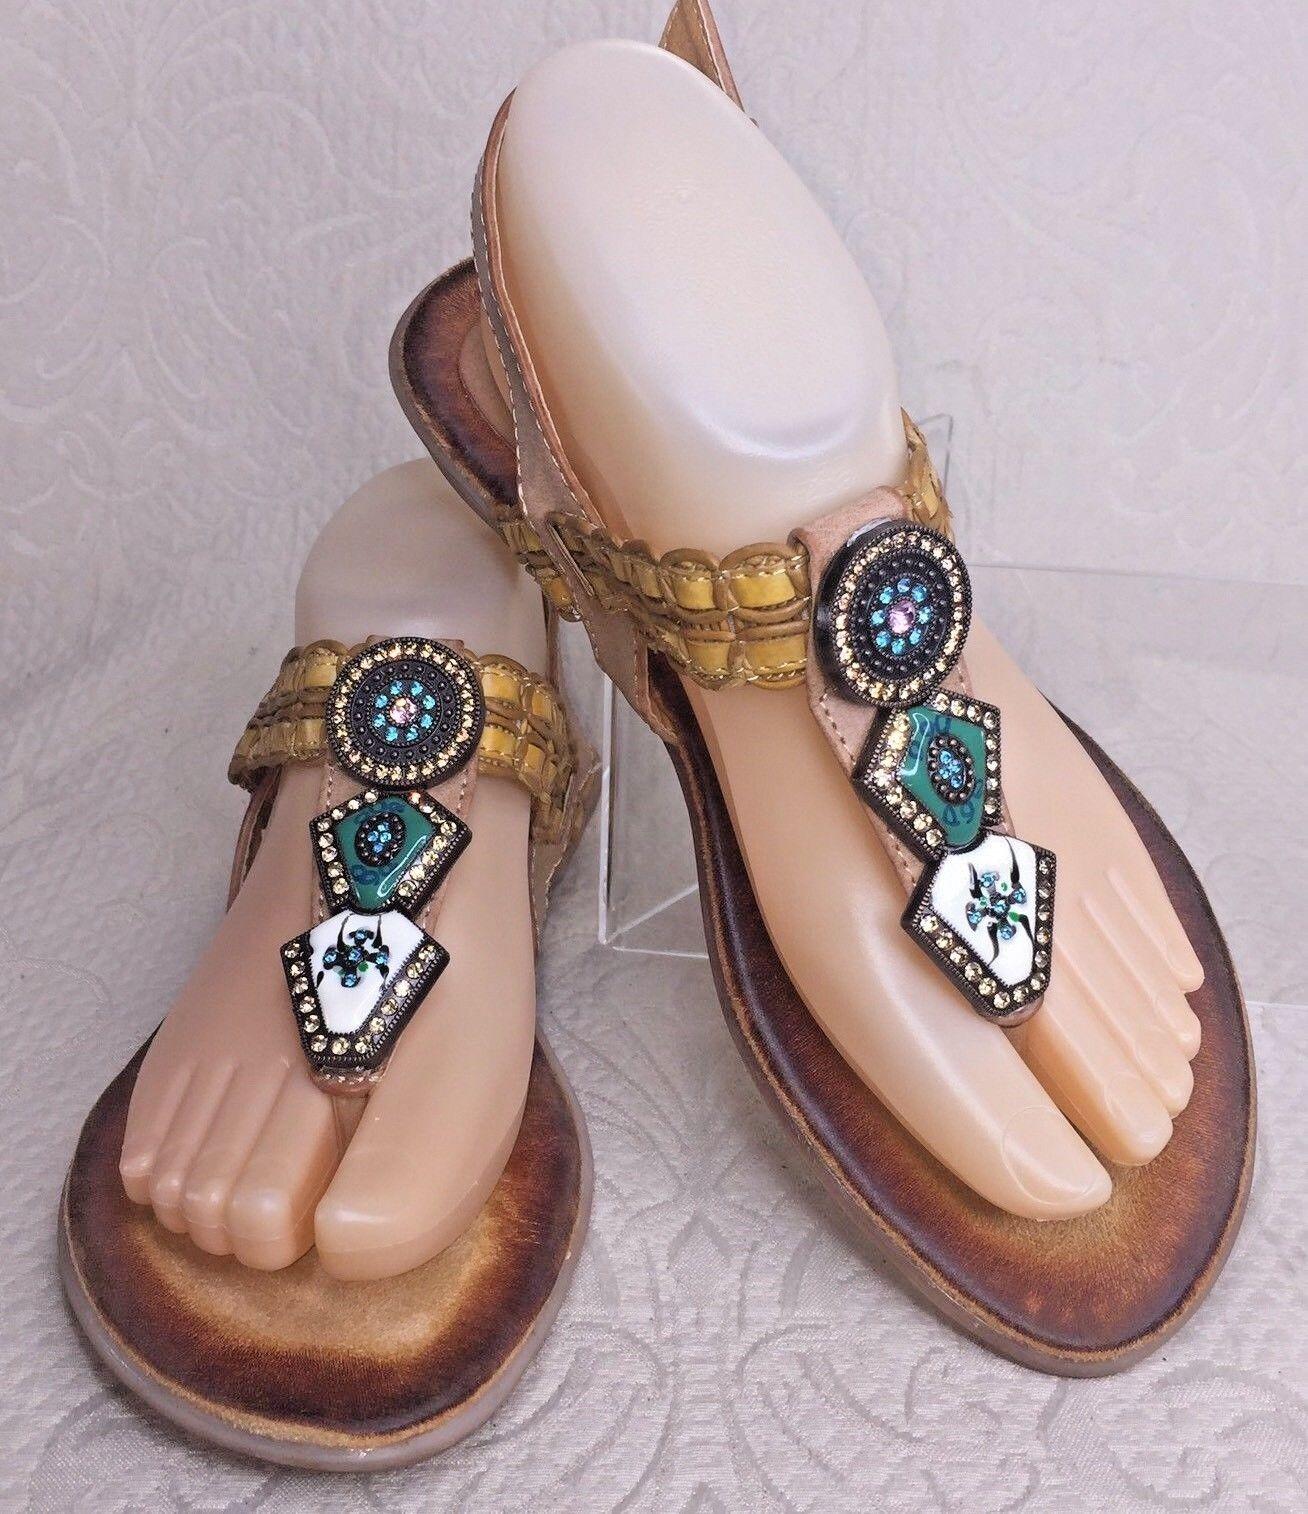 SPRING STEP PATRIZIA Sandal Women 7.5 - 8 Trinket Tan Leather Thong Jeweled New